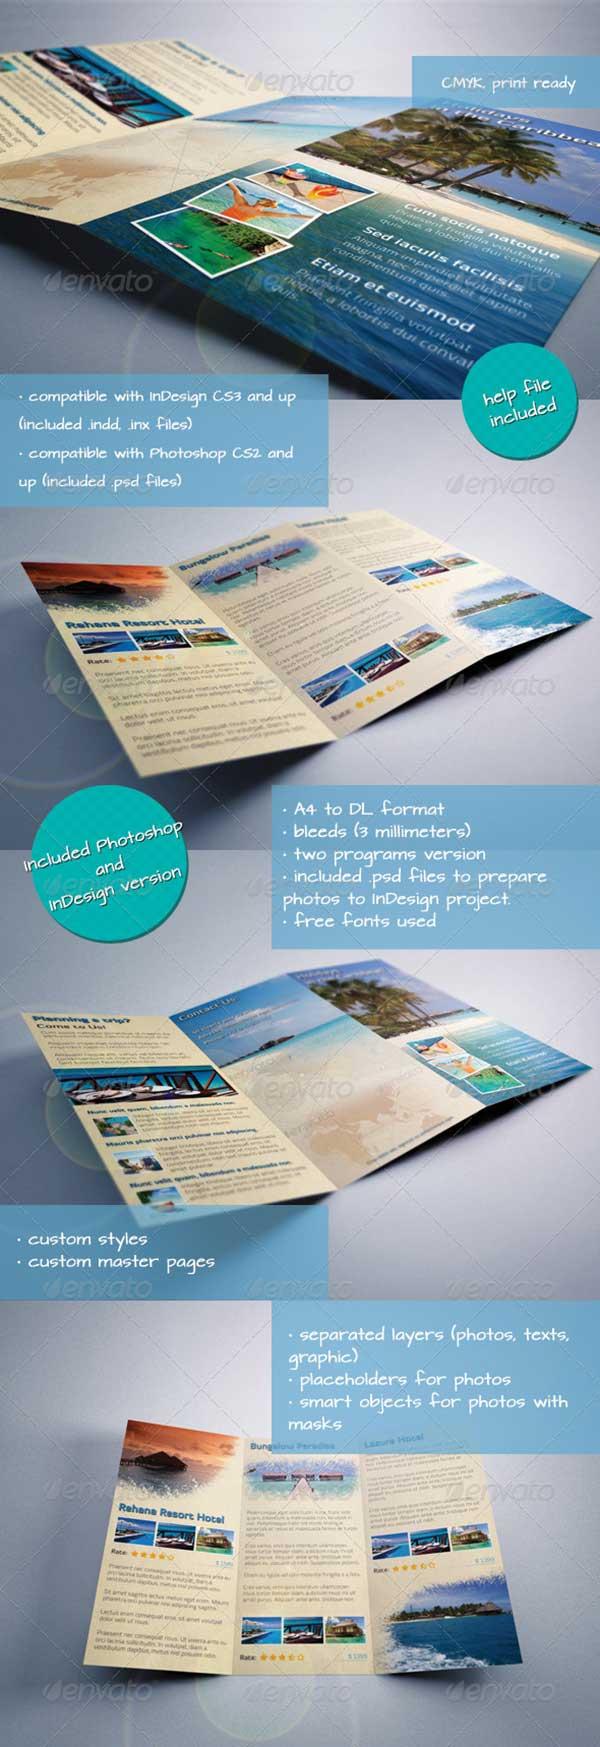 caribbean-holiday-travel-offer-tri-fold-brochure